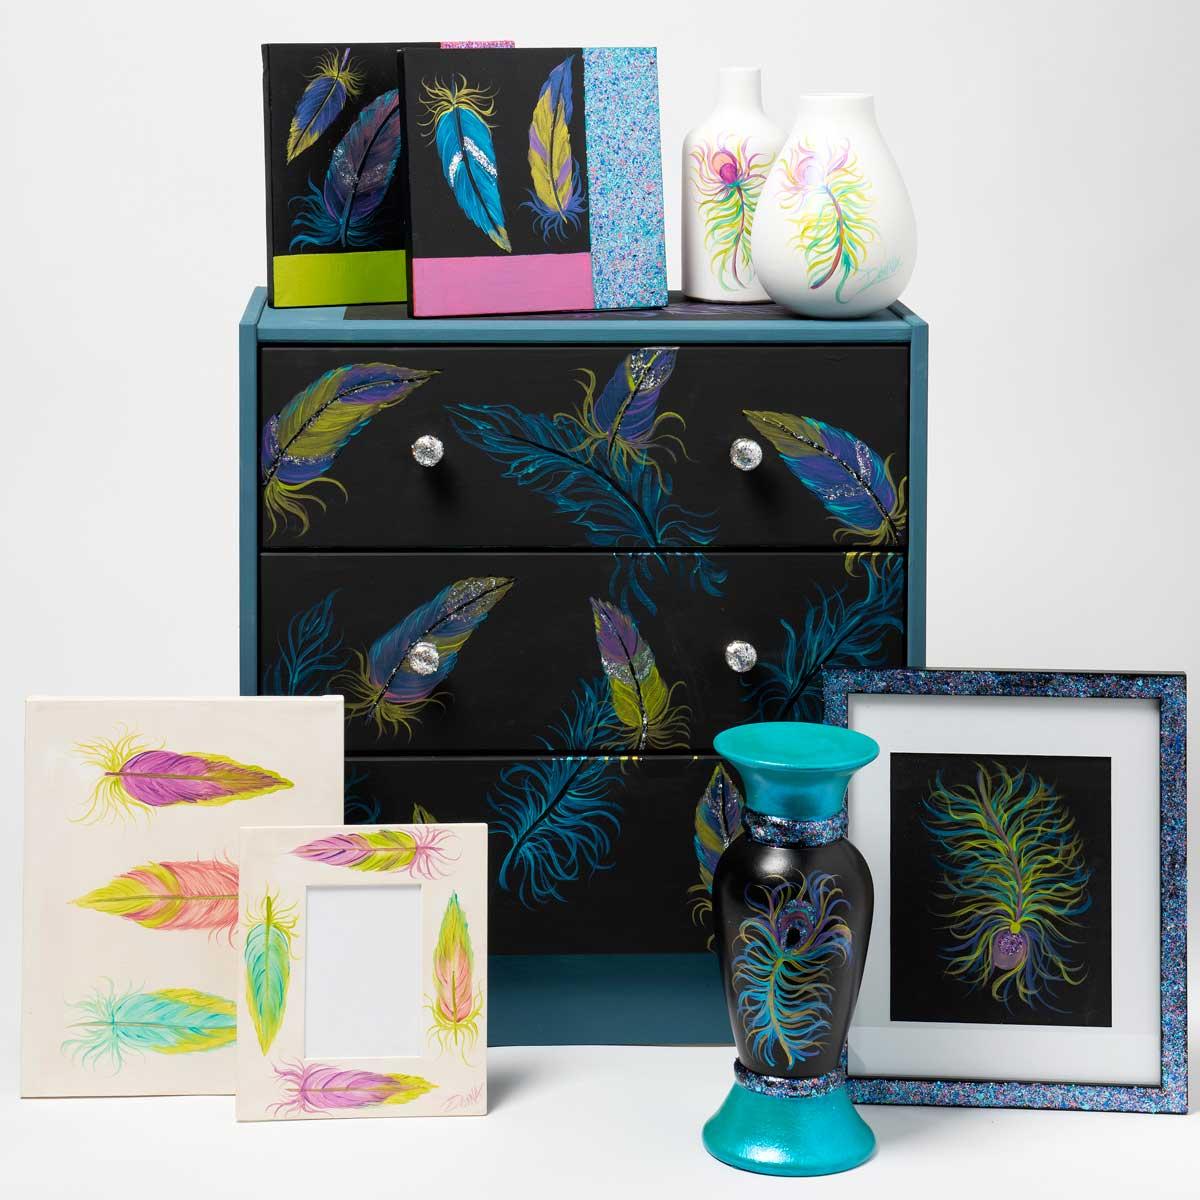 FolkArt ® One Stroke™ Color Shift™ and Glitterific™ Painting Kit - PROMOCSGK4